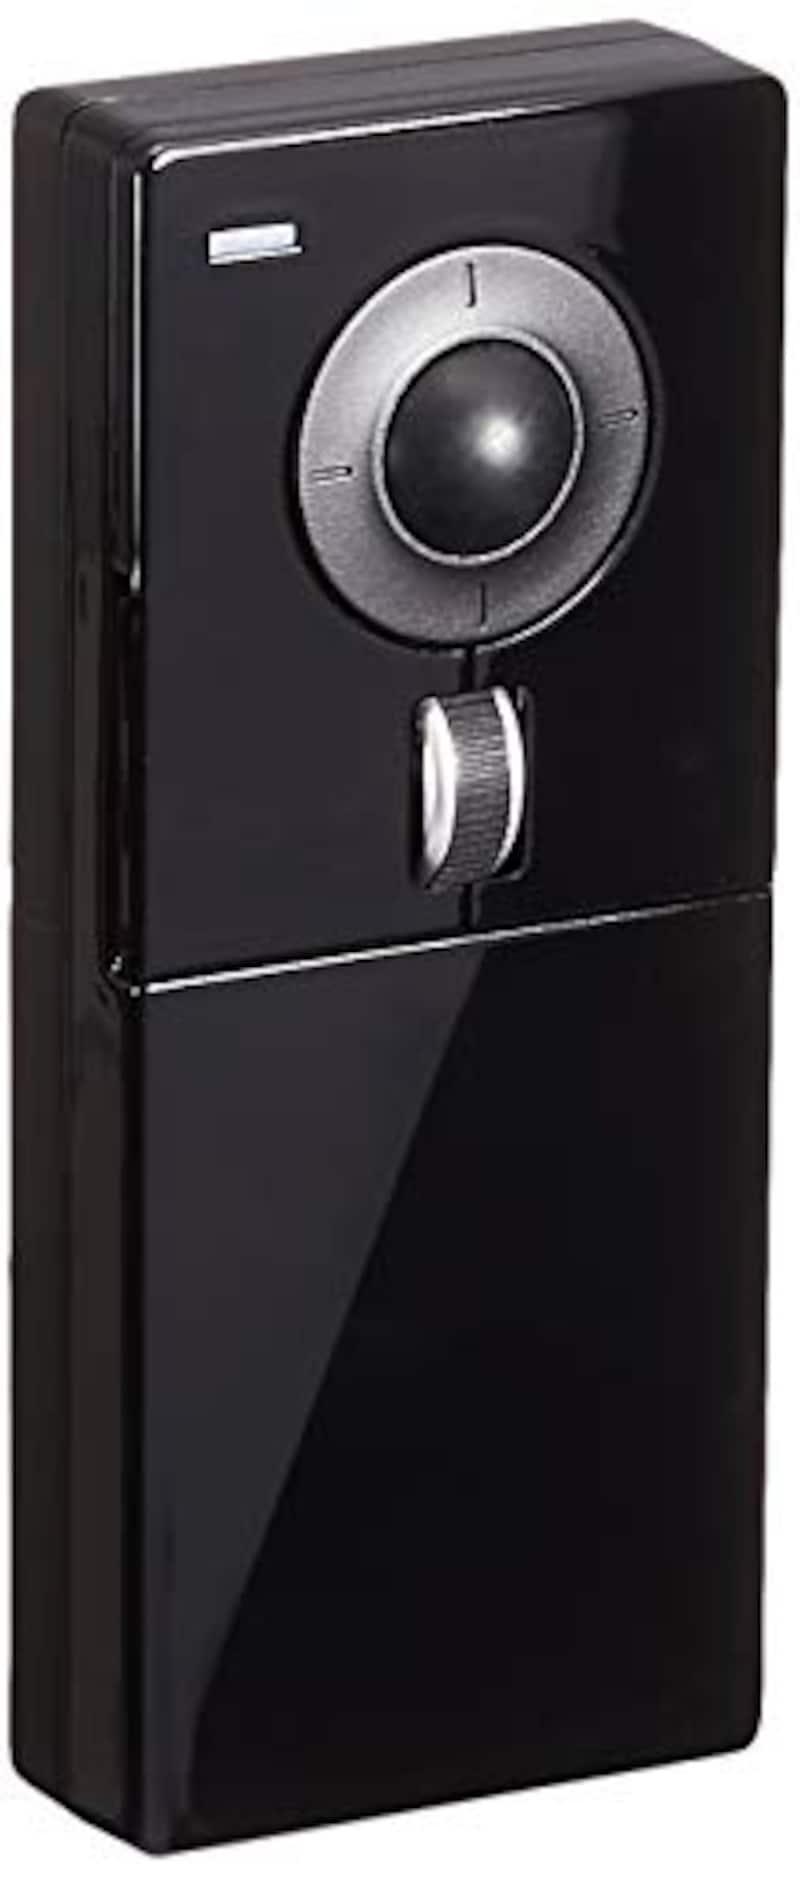 UNIQ(ユニーク),リモコン型トラックボールマウス Livina,ML001GB2